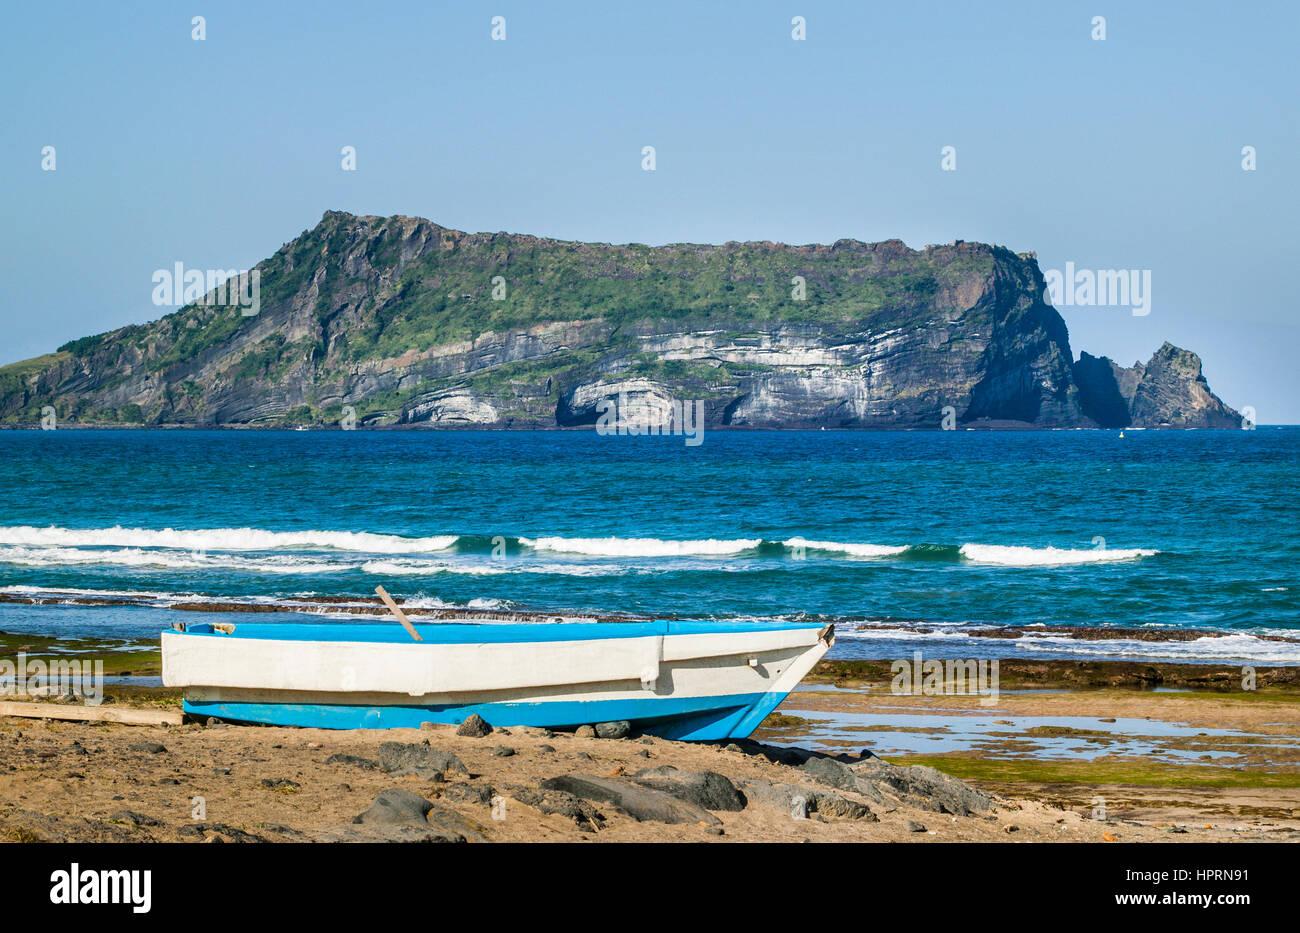 South Korea, eastern seaboard of Jeju Island, view of thw 182 metre tuff cone of Seongsan Ilchulbong Sunrise Peak Stock Photo